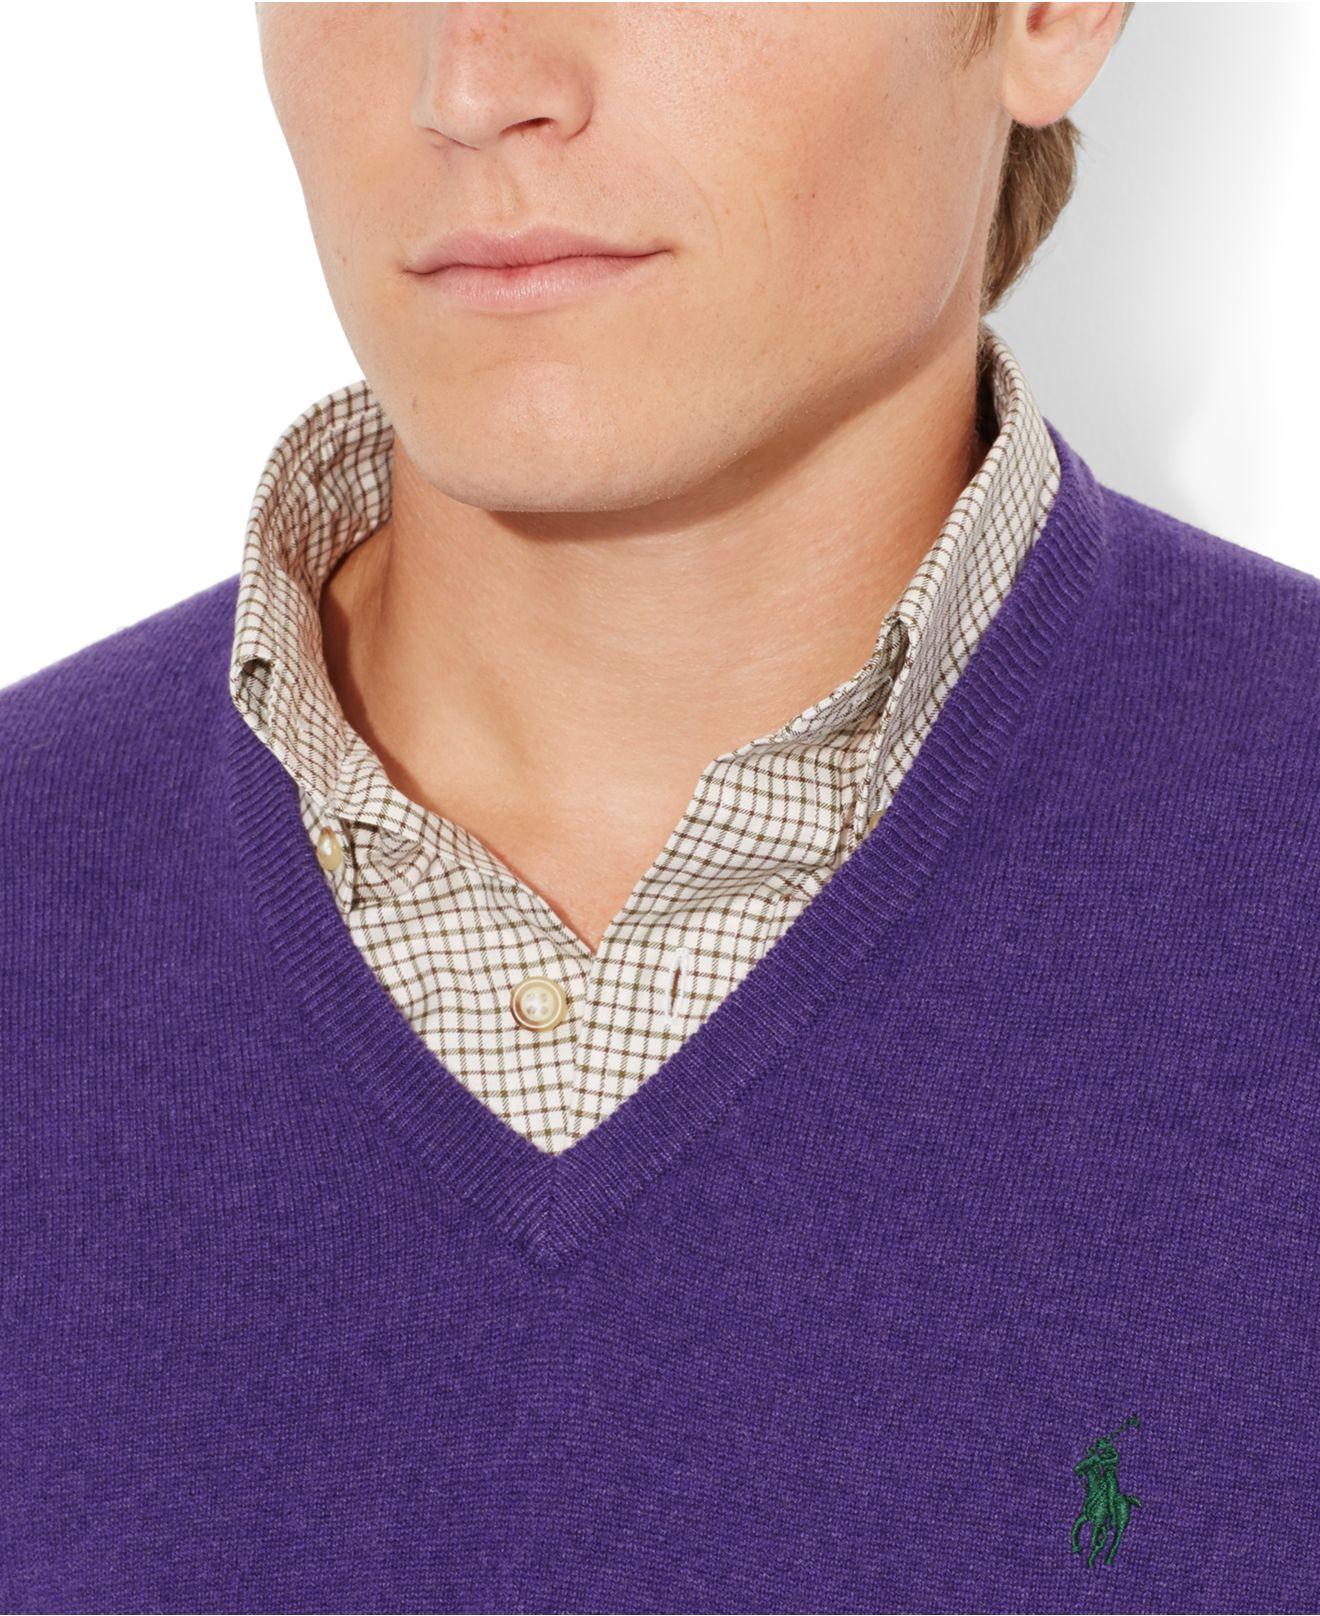 Polo ralph lauren Loryelle Merino Wool V-Neck Sweater in Purple ...